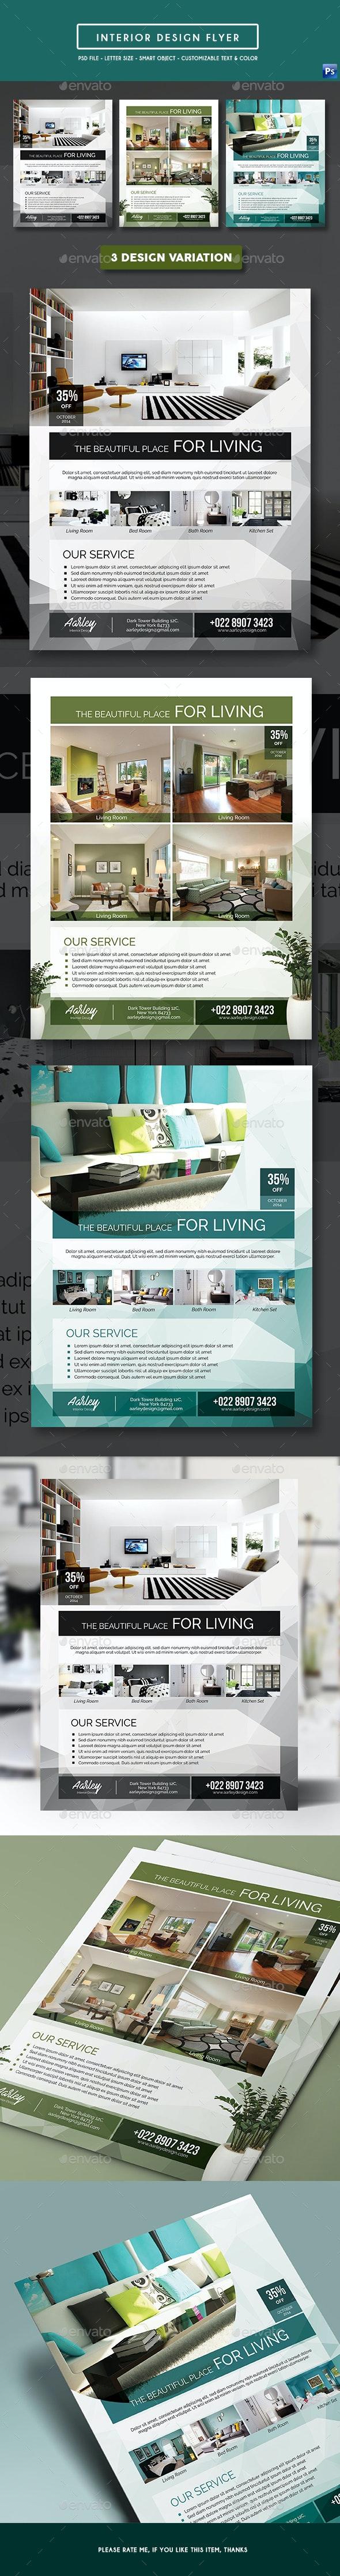 Interior Design Flyer - Corporate Flyers